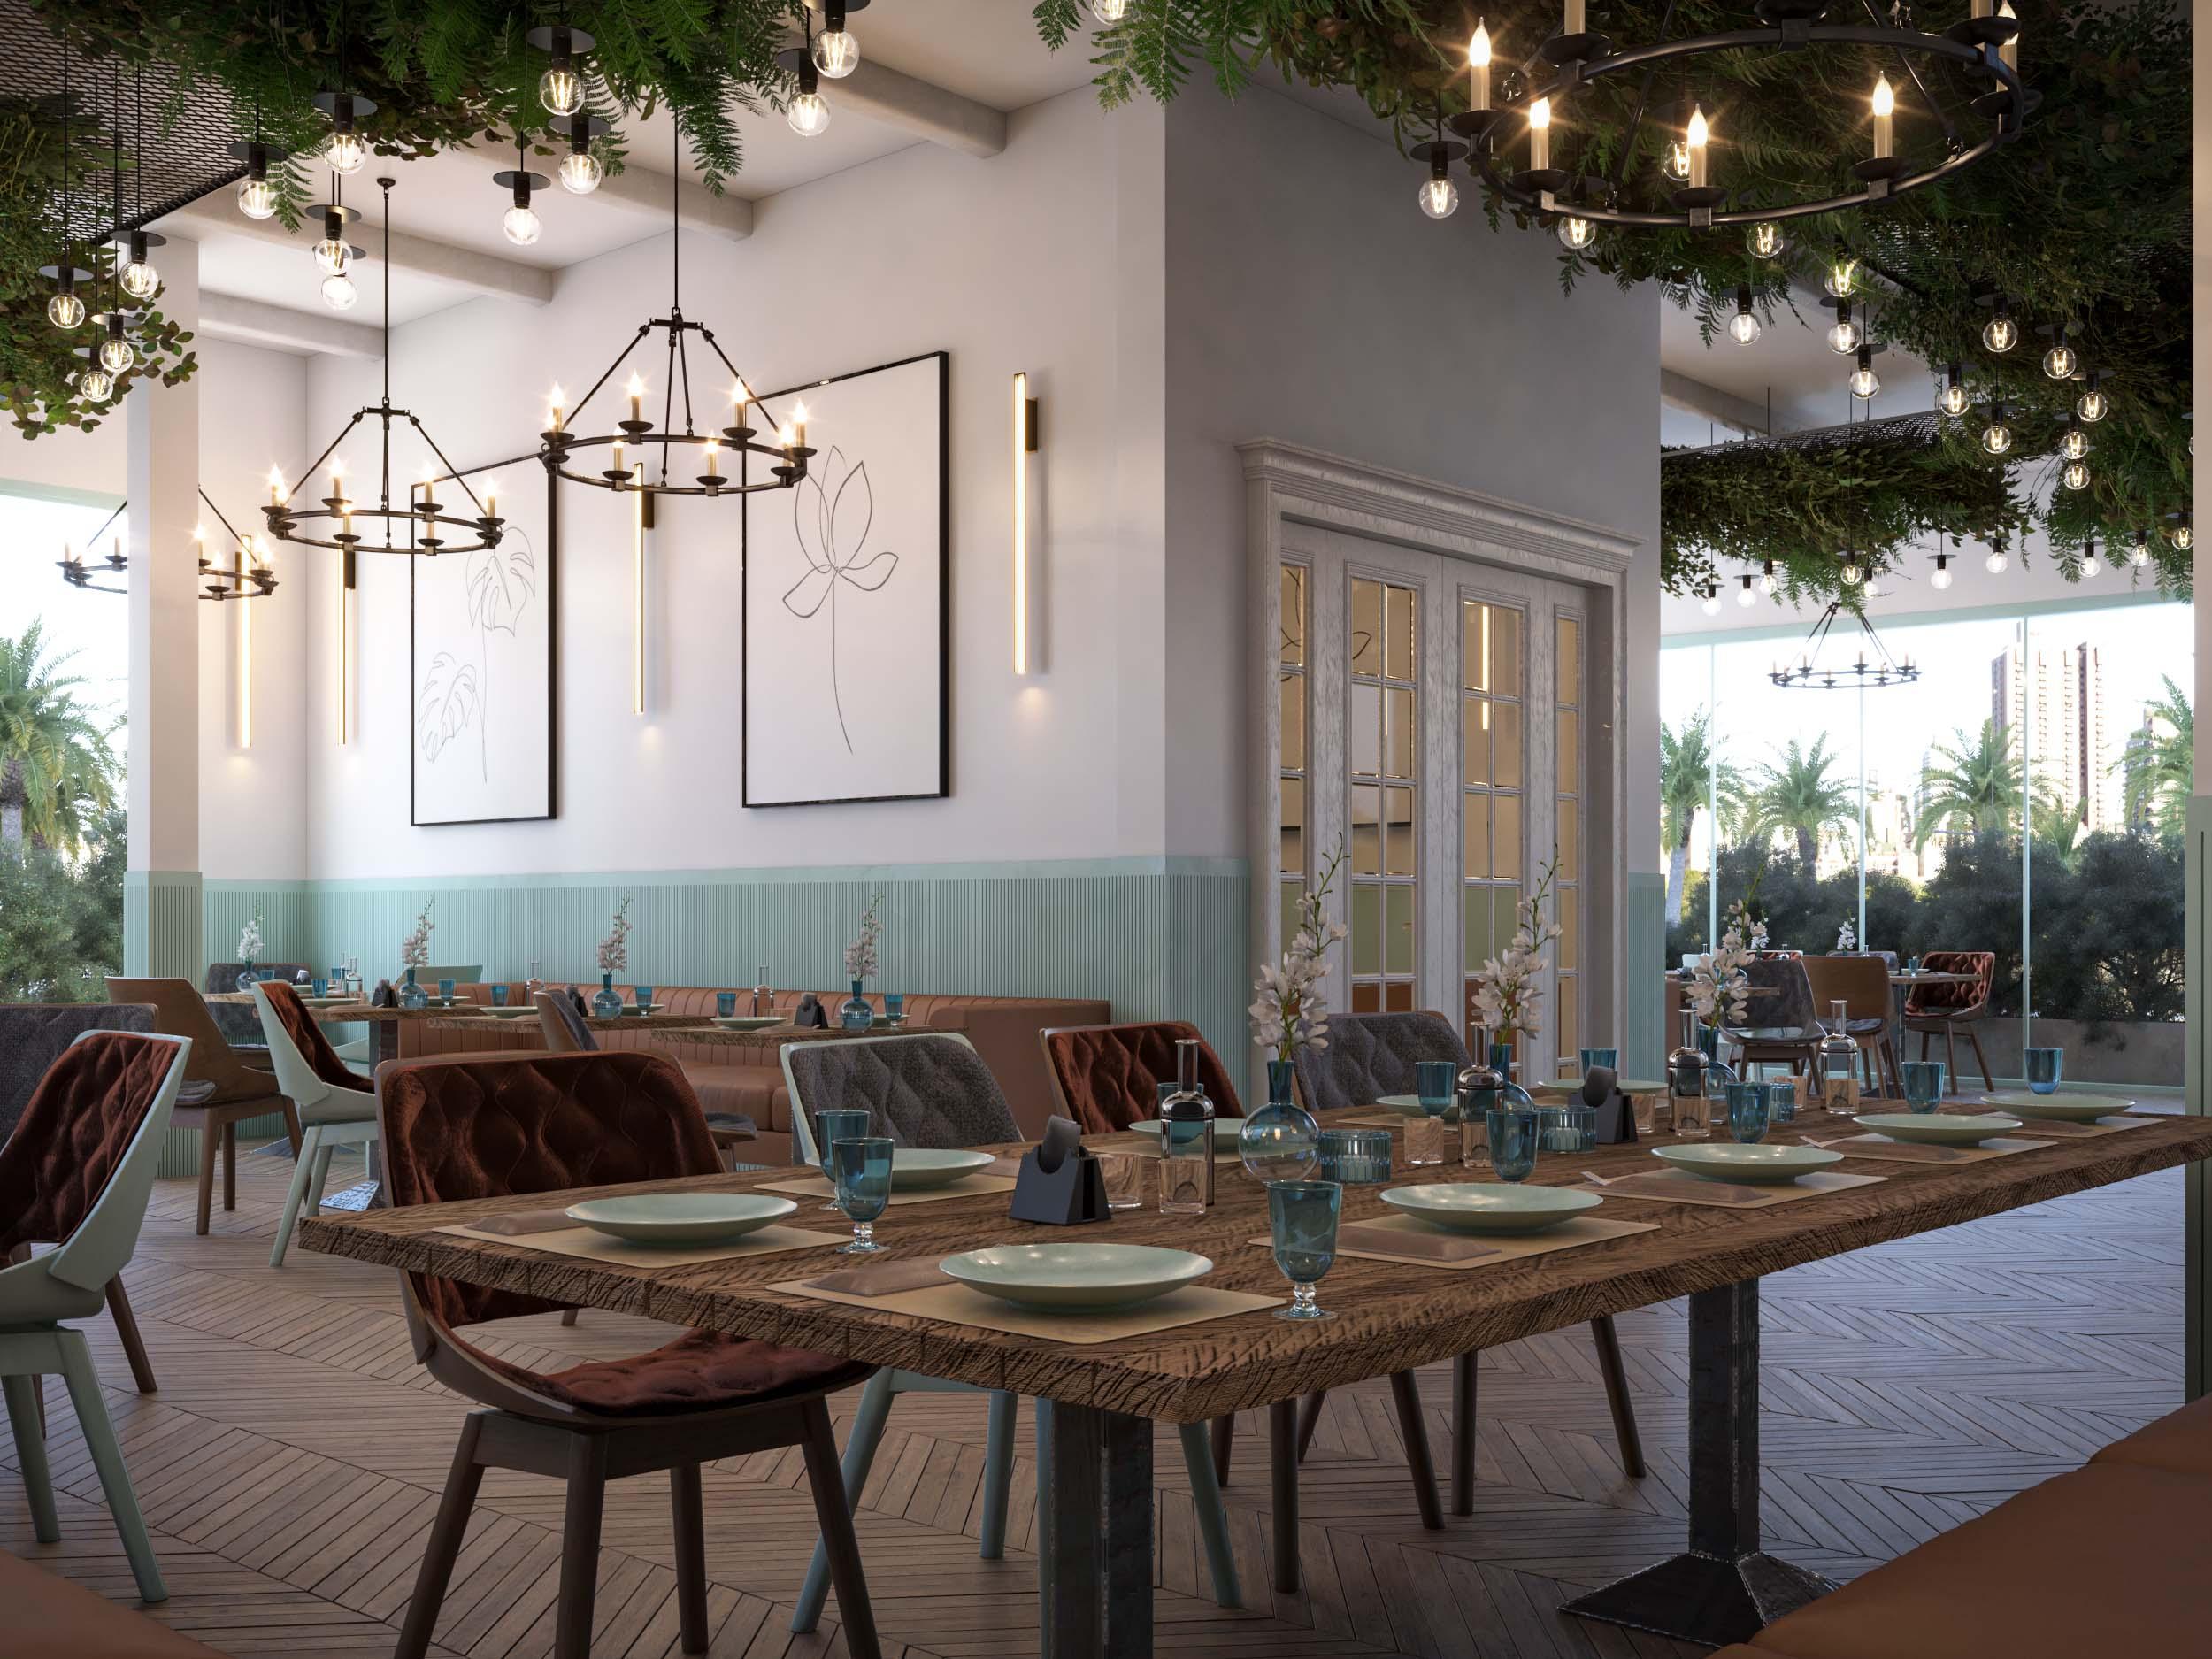 TABLE - CHAIRS - RETAURANT - PLANTS